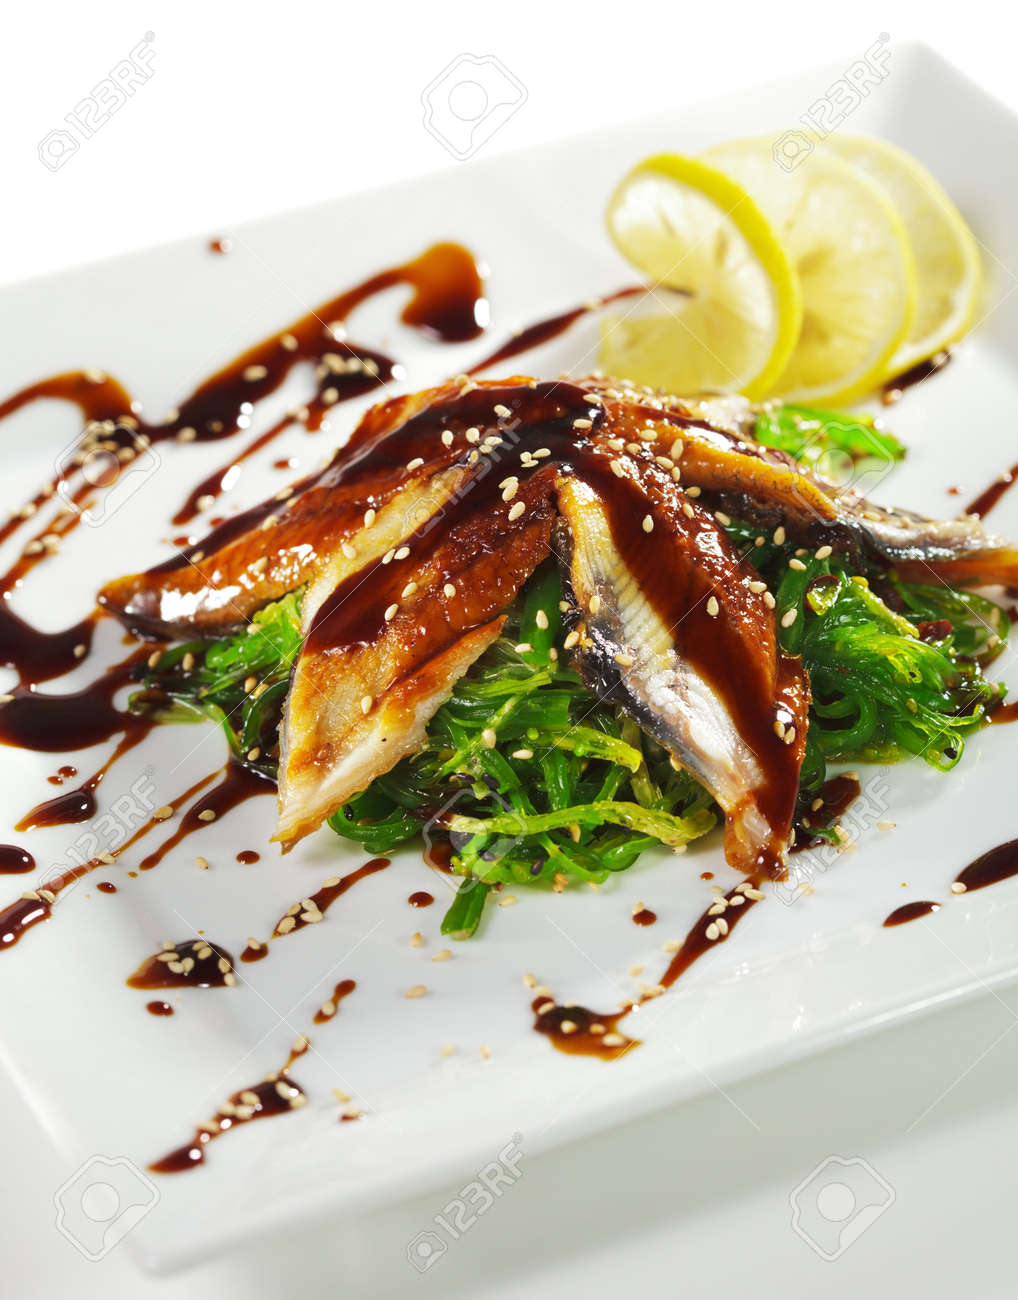 Japanese Cuisine - Chuka Seaweed and Unagi (smoked eel) Salad with Nuts Sauce. Topped with Eel Sauce and Sesame Stock Photo - 5925248